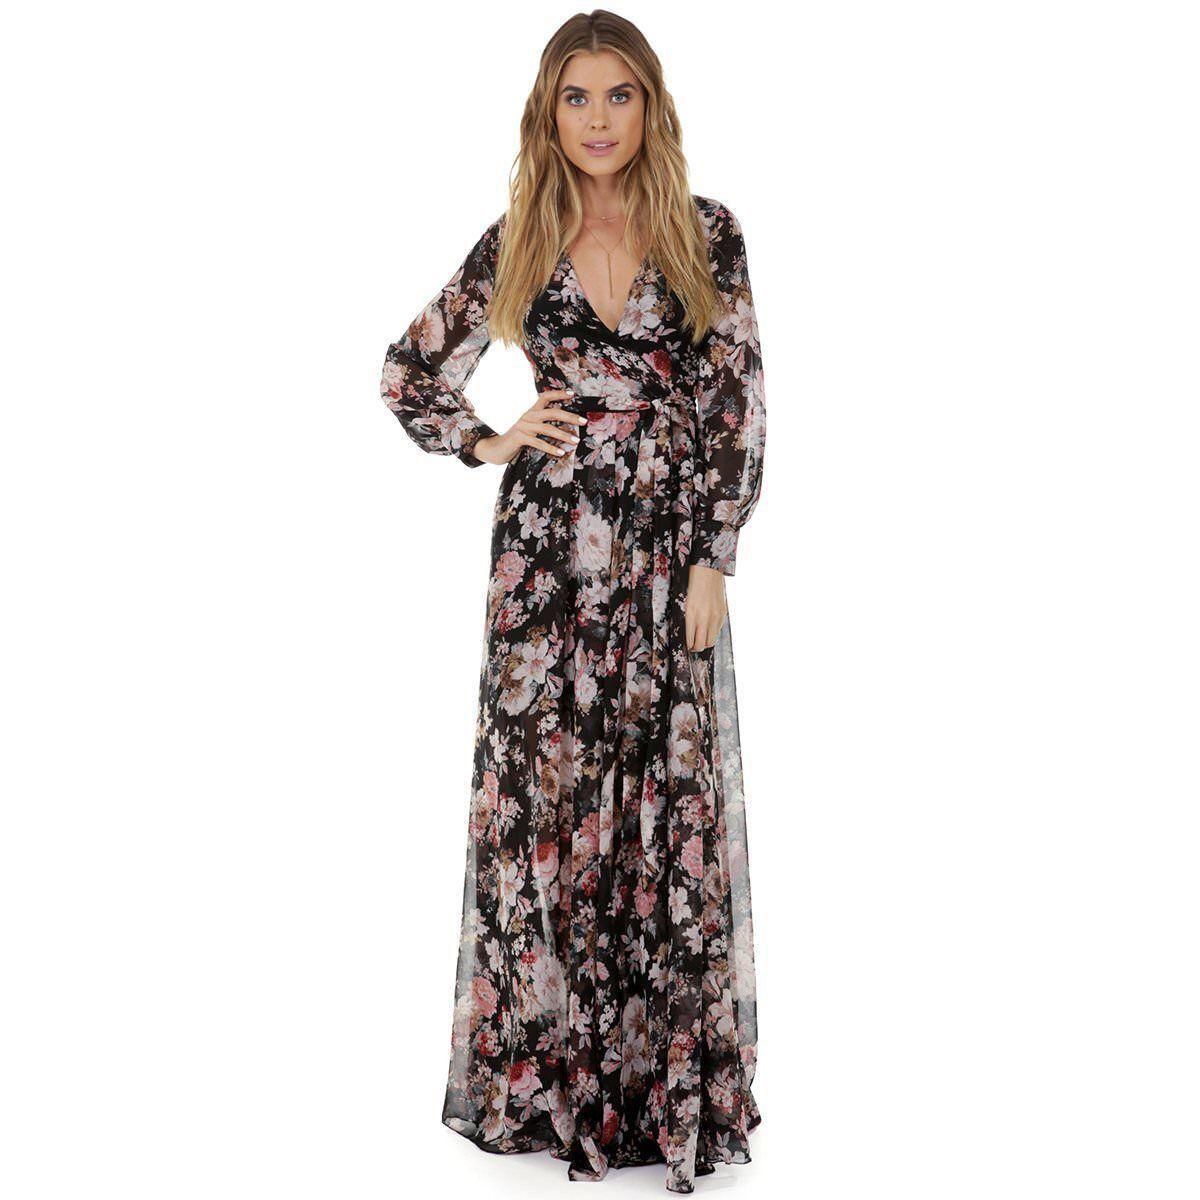 Women BOHO Floral Print Beach Dress Lady Evening Party Short Sleeve Maxi Dress Women Summer Dress Ladies Polyester Full Dresses